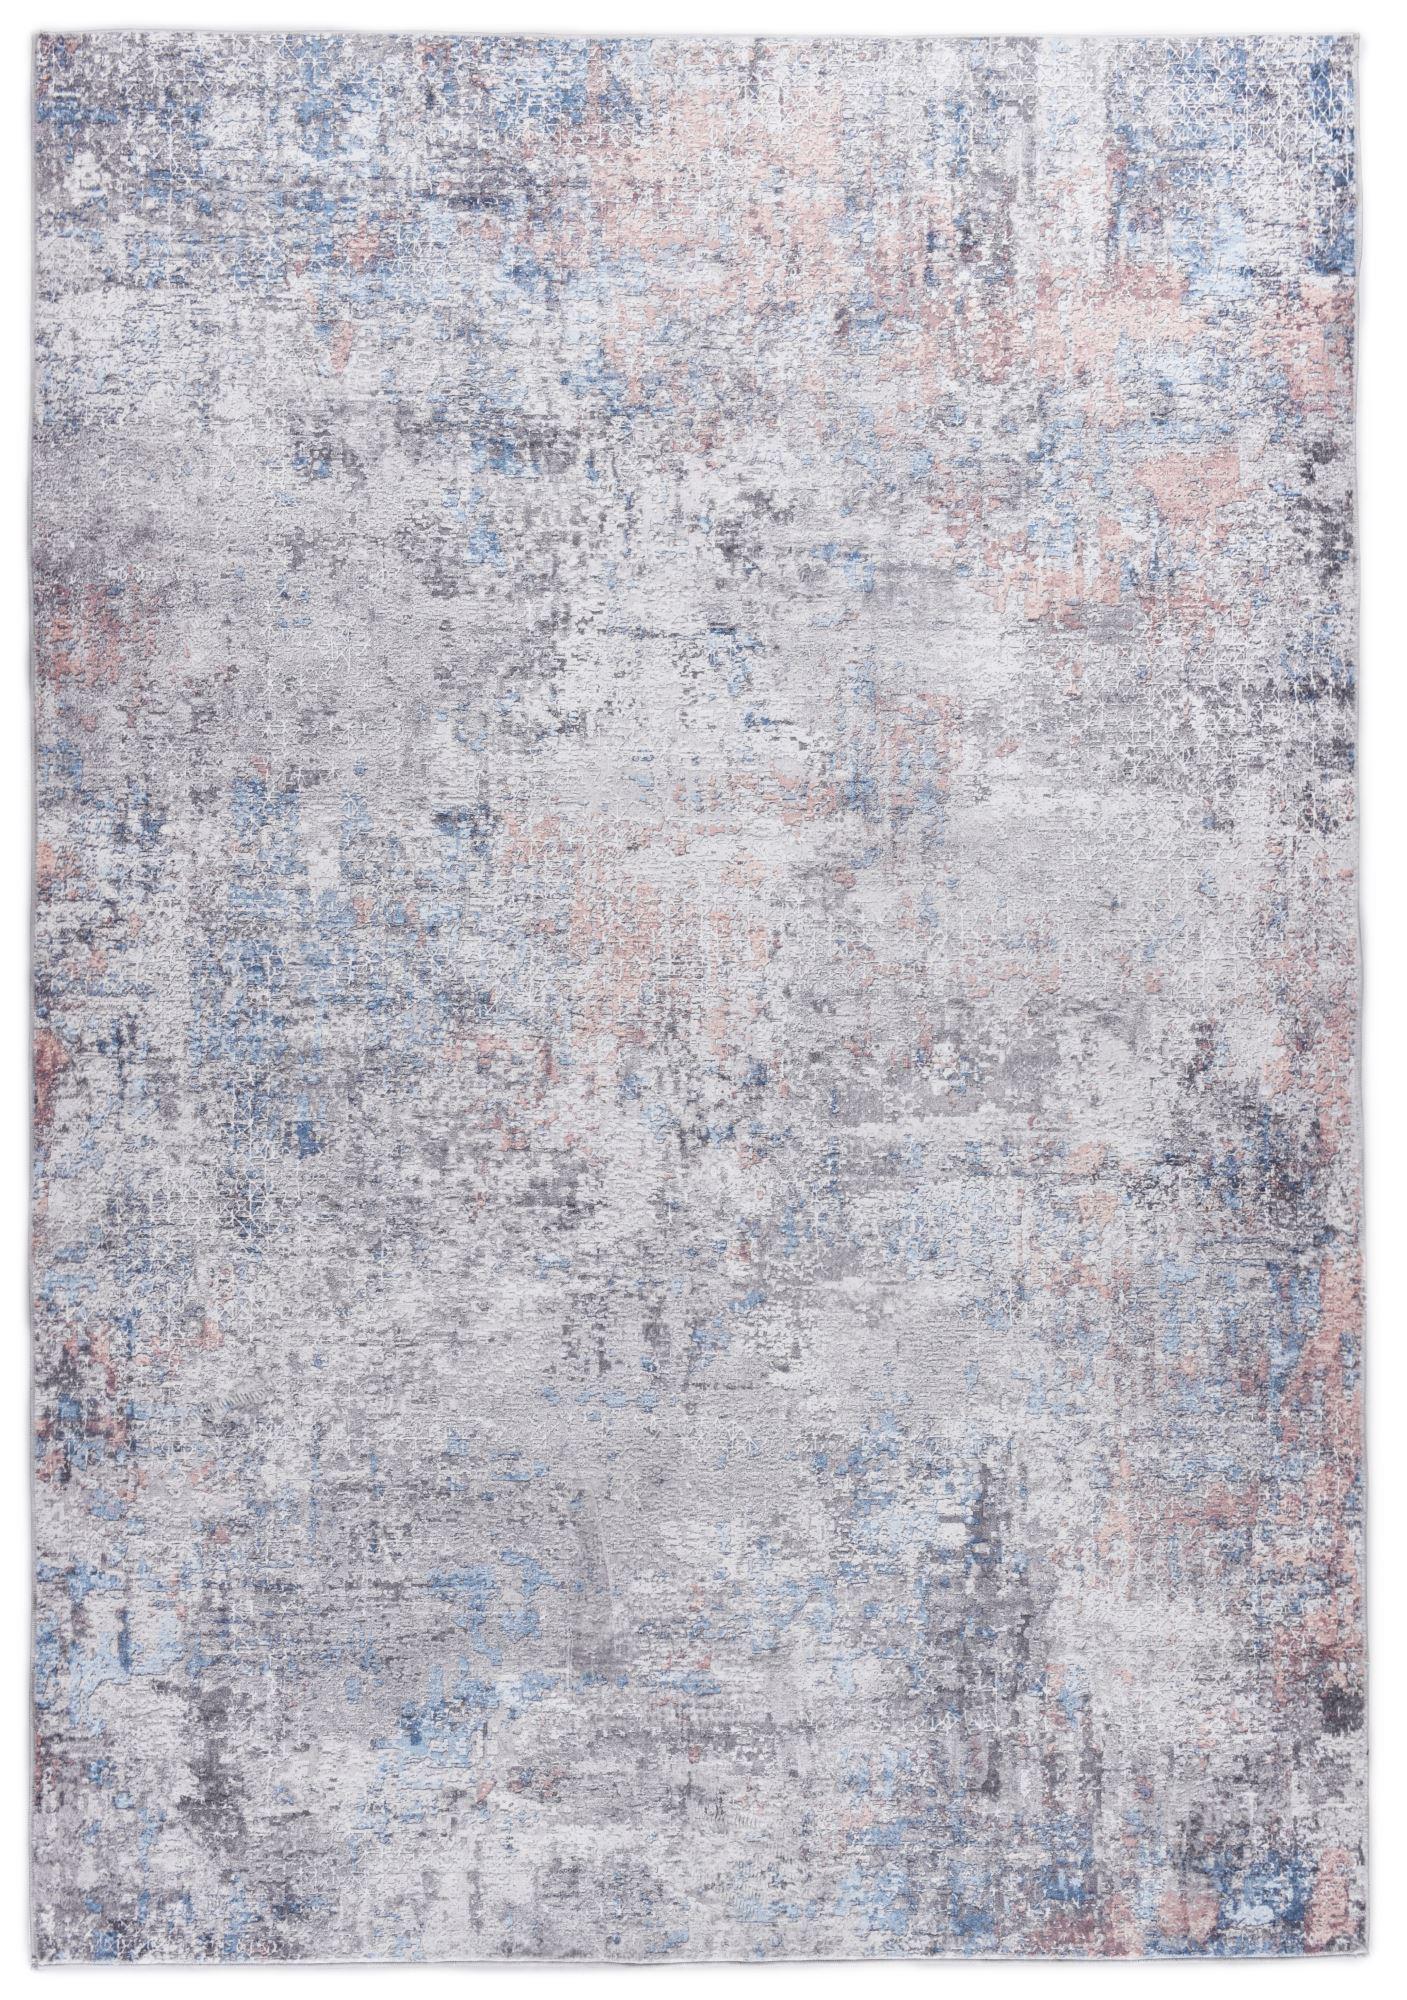 Tapis imprimé - gris multicolore 70x140 cm